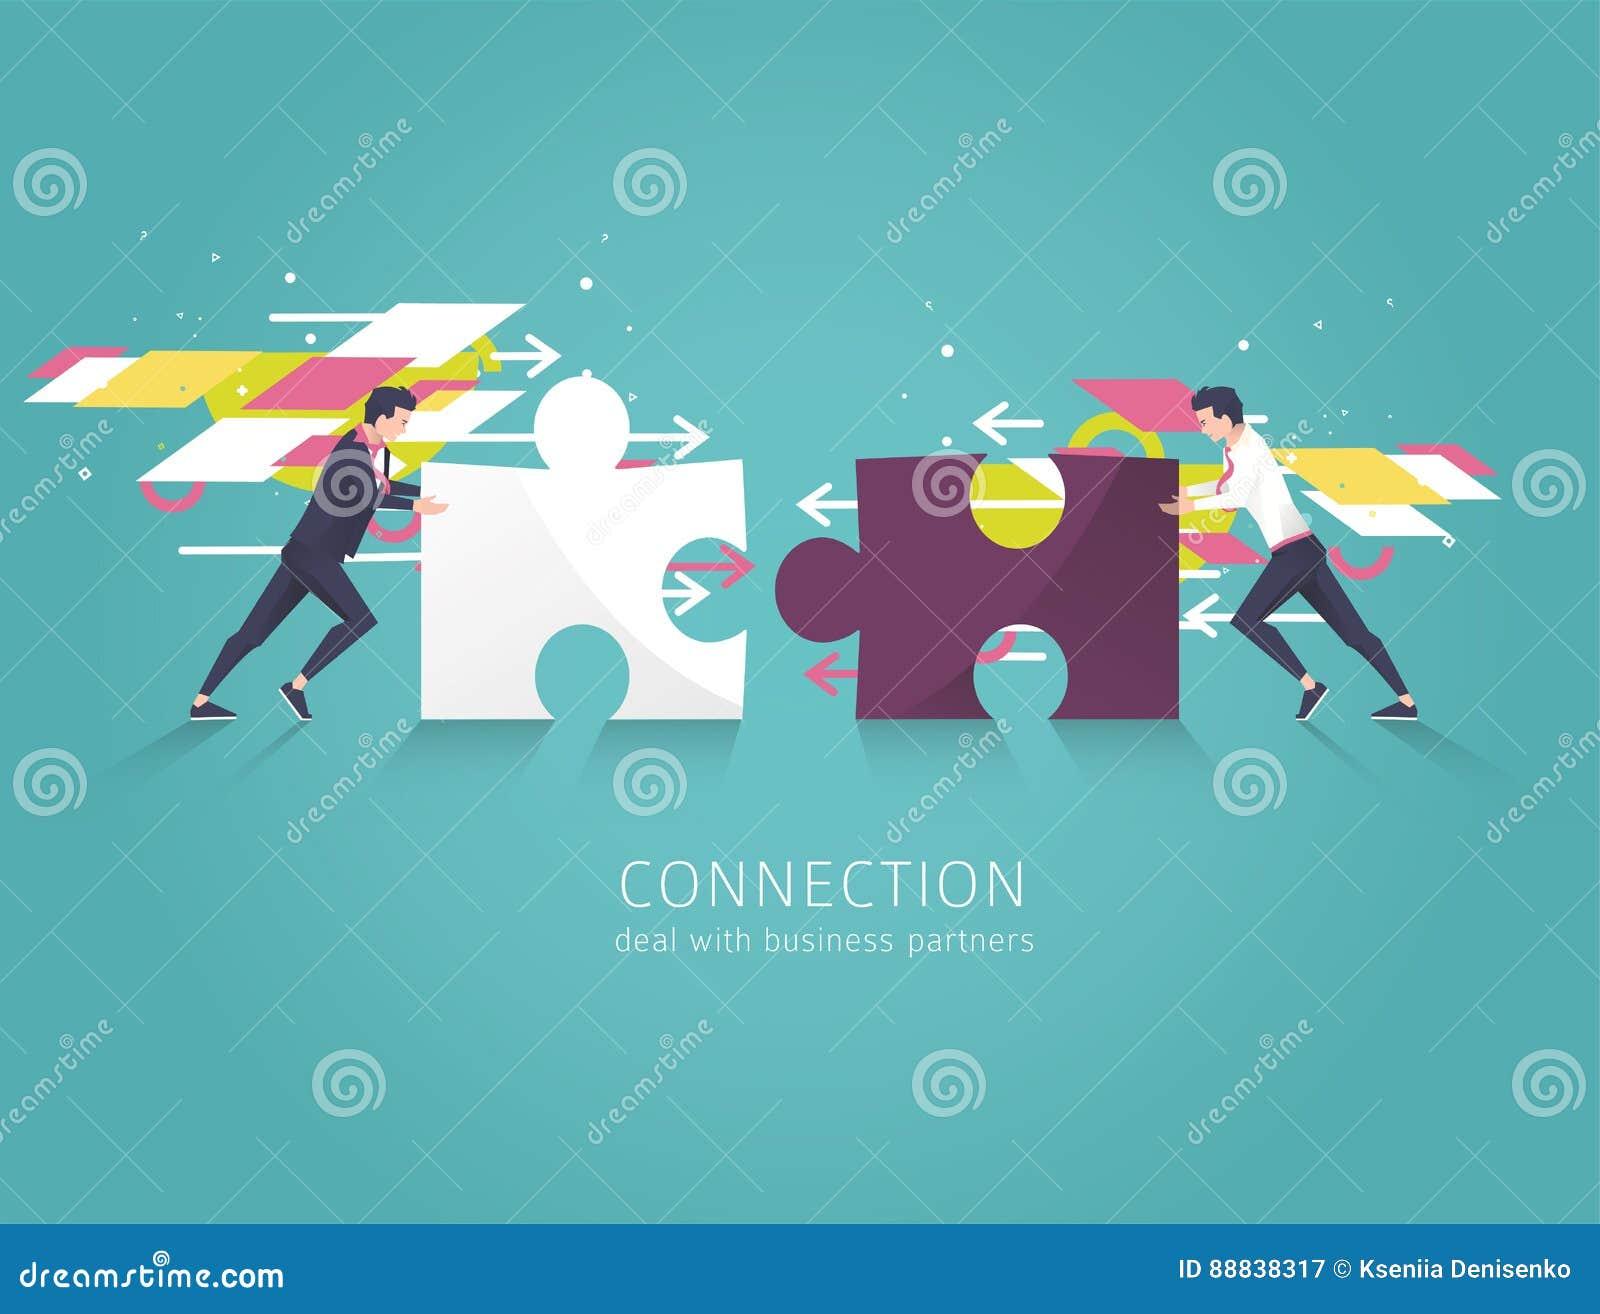 Bedrijfsconcept oplossing, vennootschap, samenwerking en steun